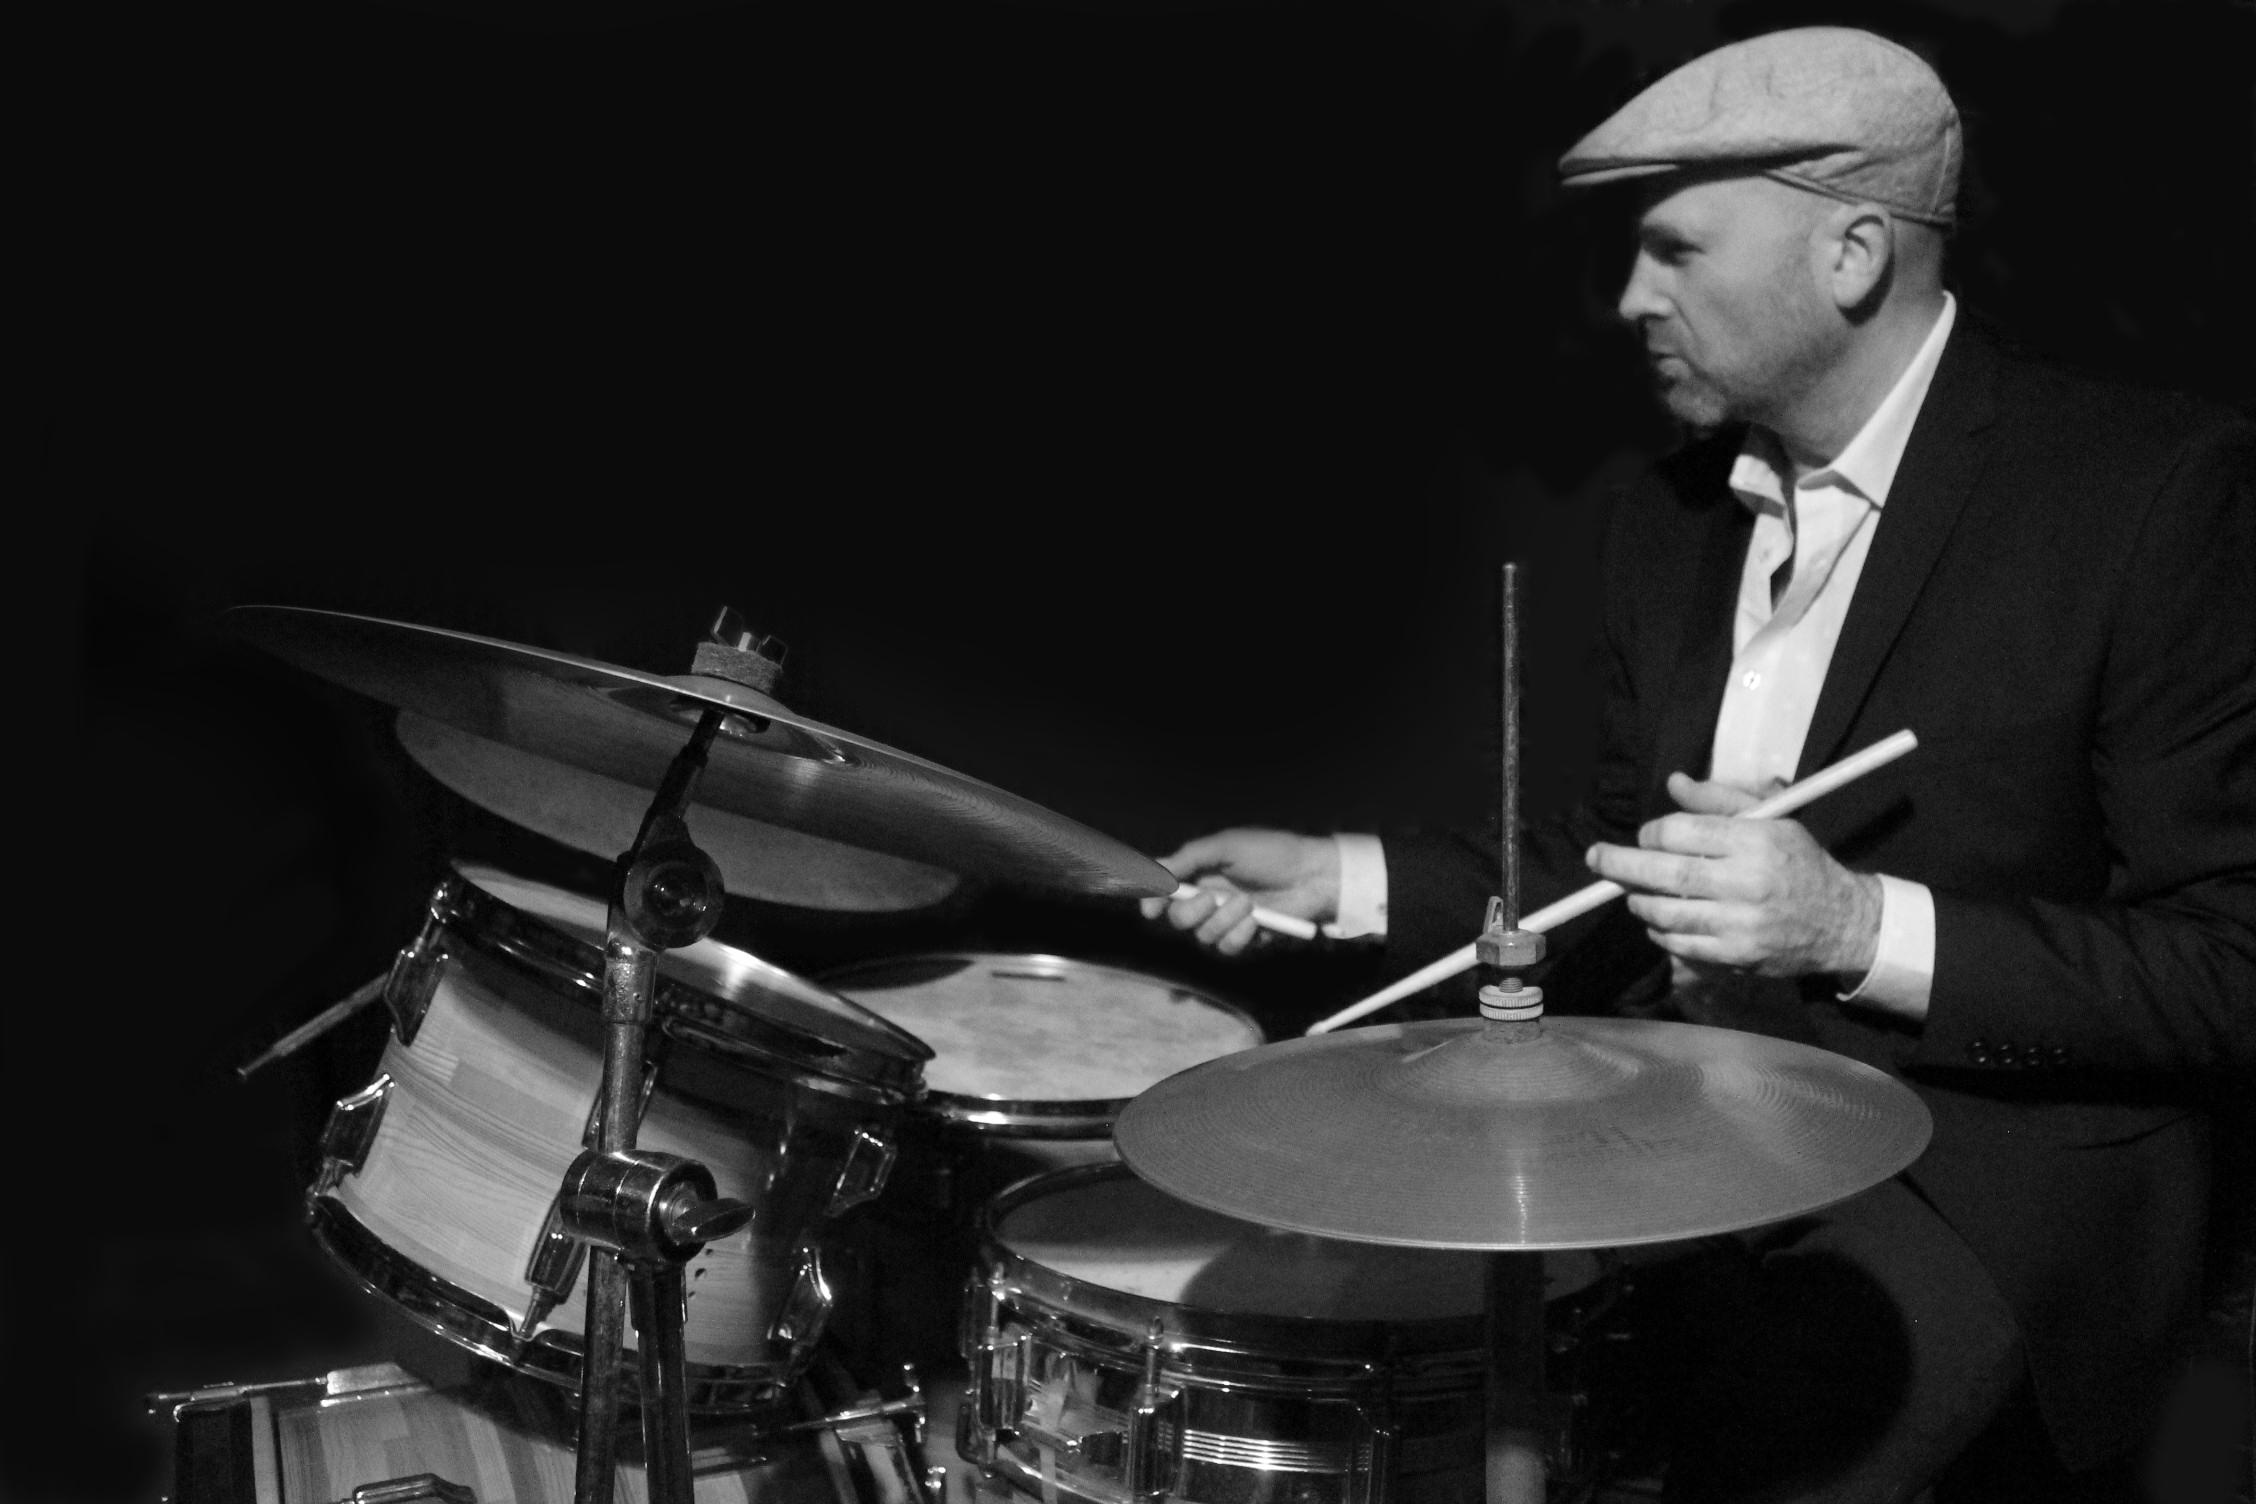 The Pete Neville Jazz Experience - THURSDAY AUGUSt 22nd, 2019#liveatdust #jazzatdustLEARN MORE